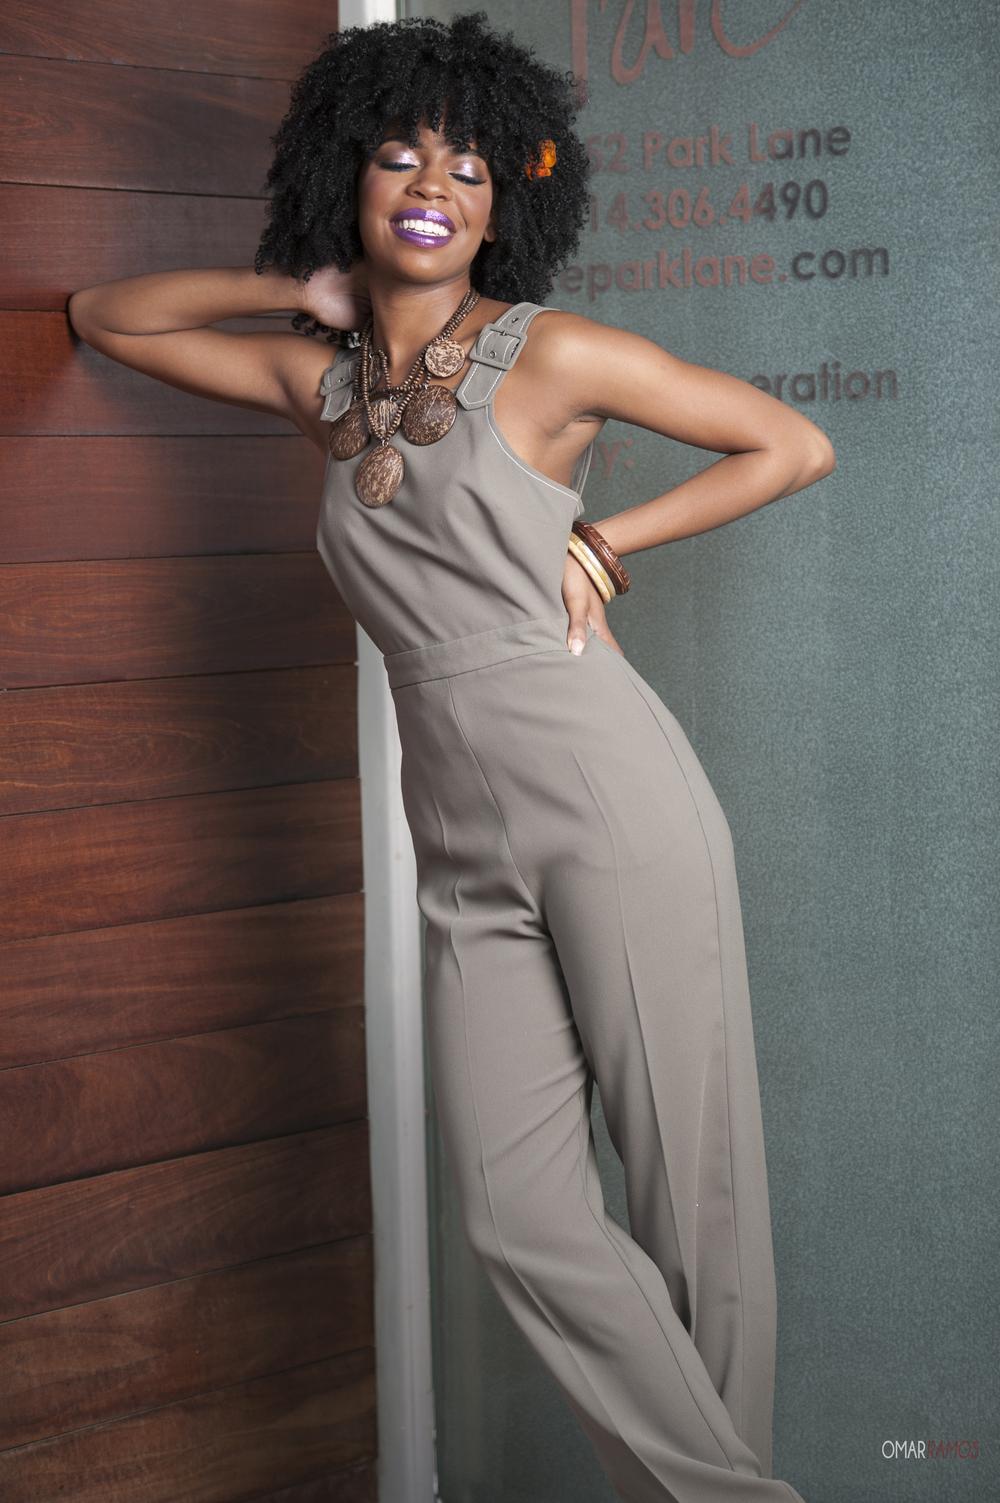 Ciara-8997.jpg